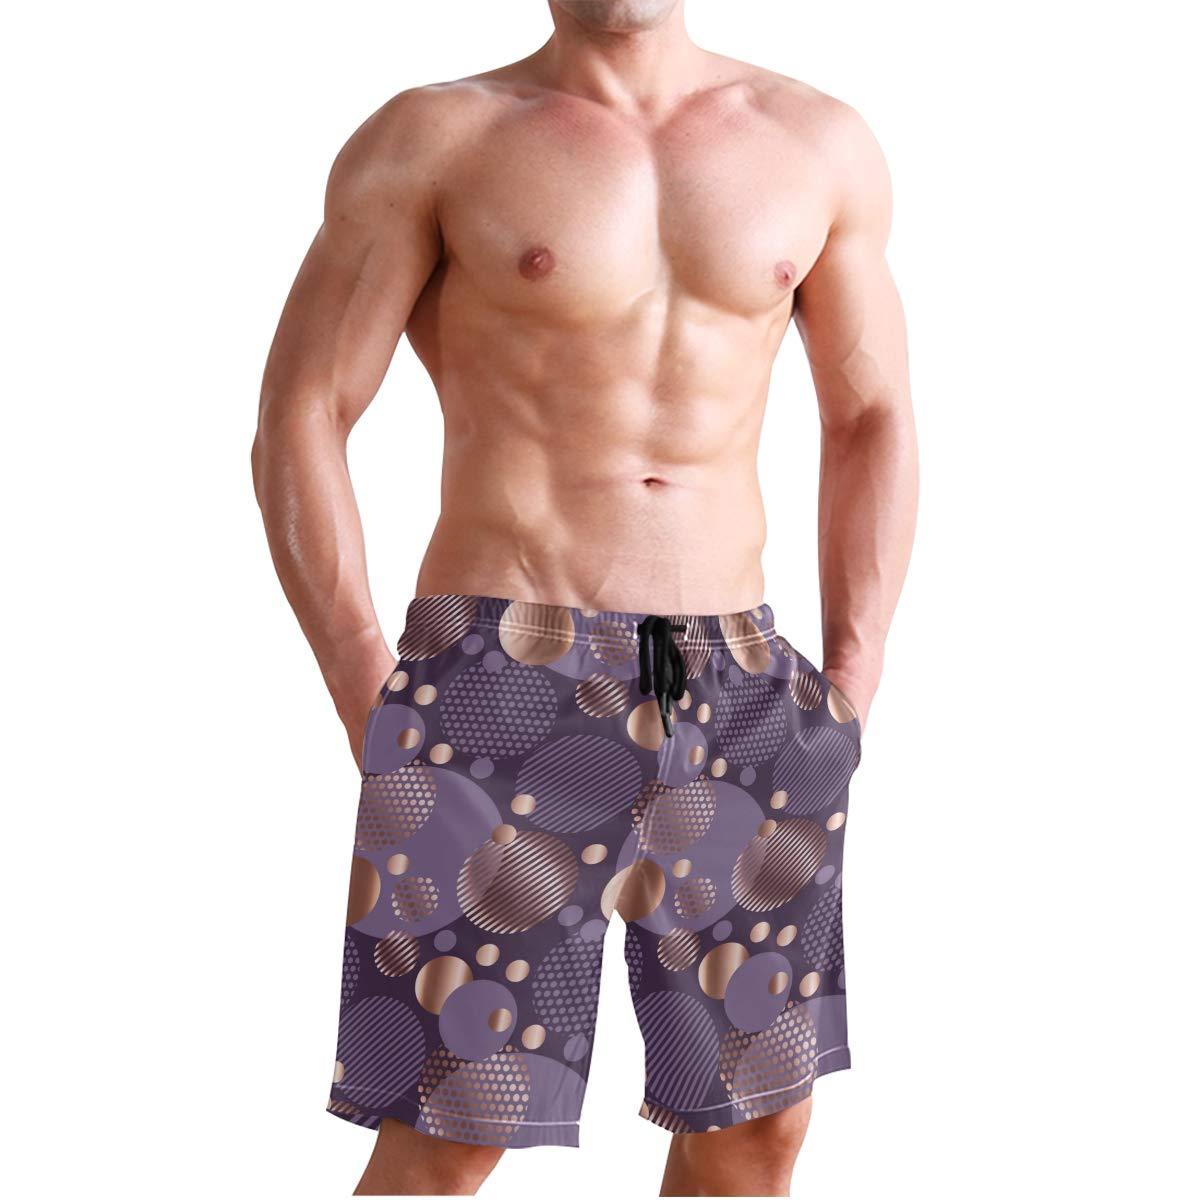 KVMV Romantic Teenager Love Sign Hearts On Grunge Stripes Lines Quick Dry Beach Shorts